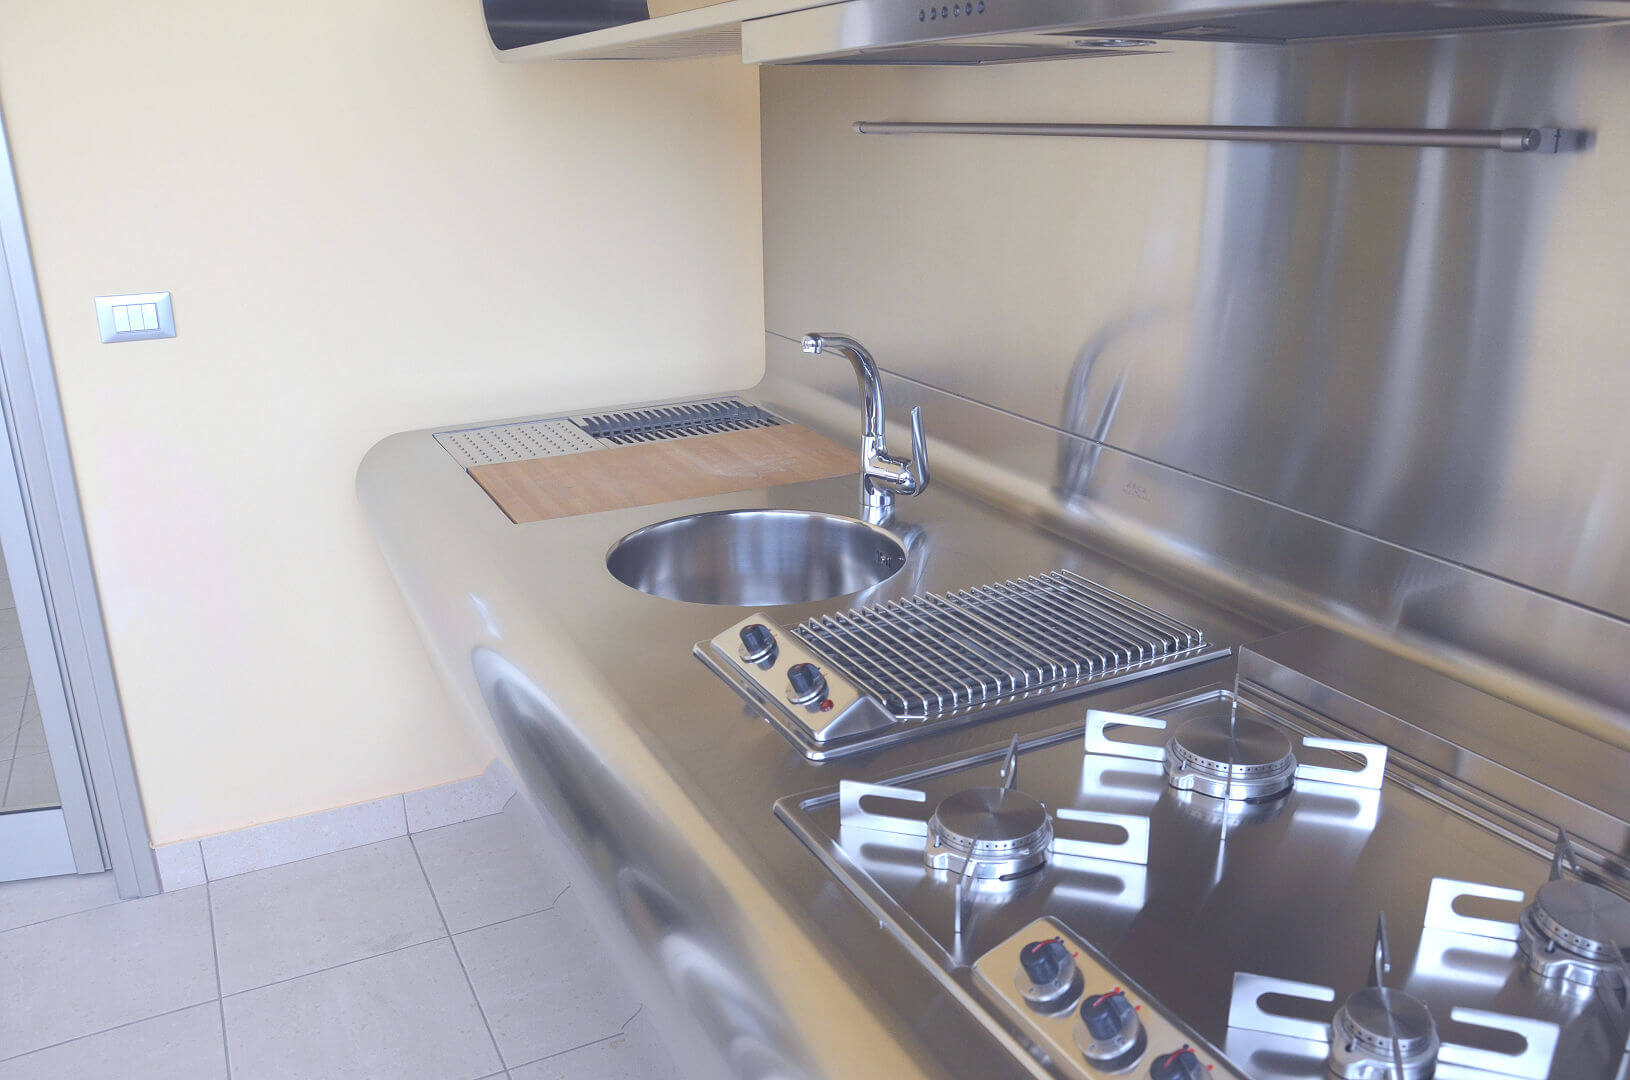 Arca Cucine Italy - Domestic stainless steel kitchens - Yacth - monoblock